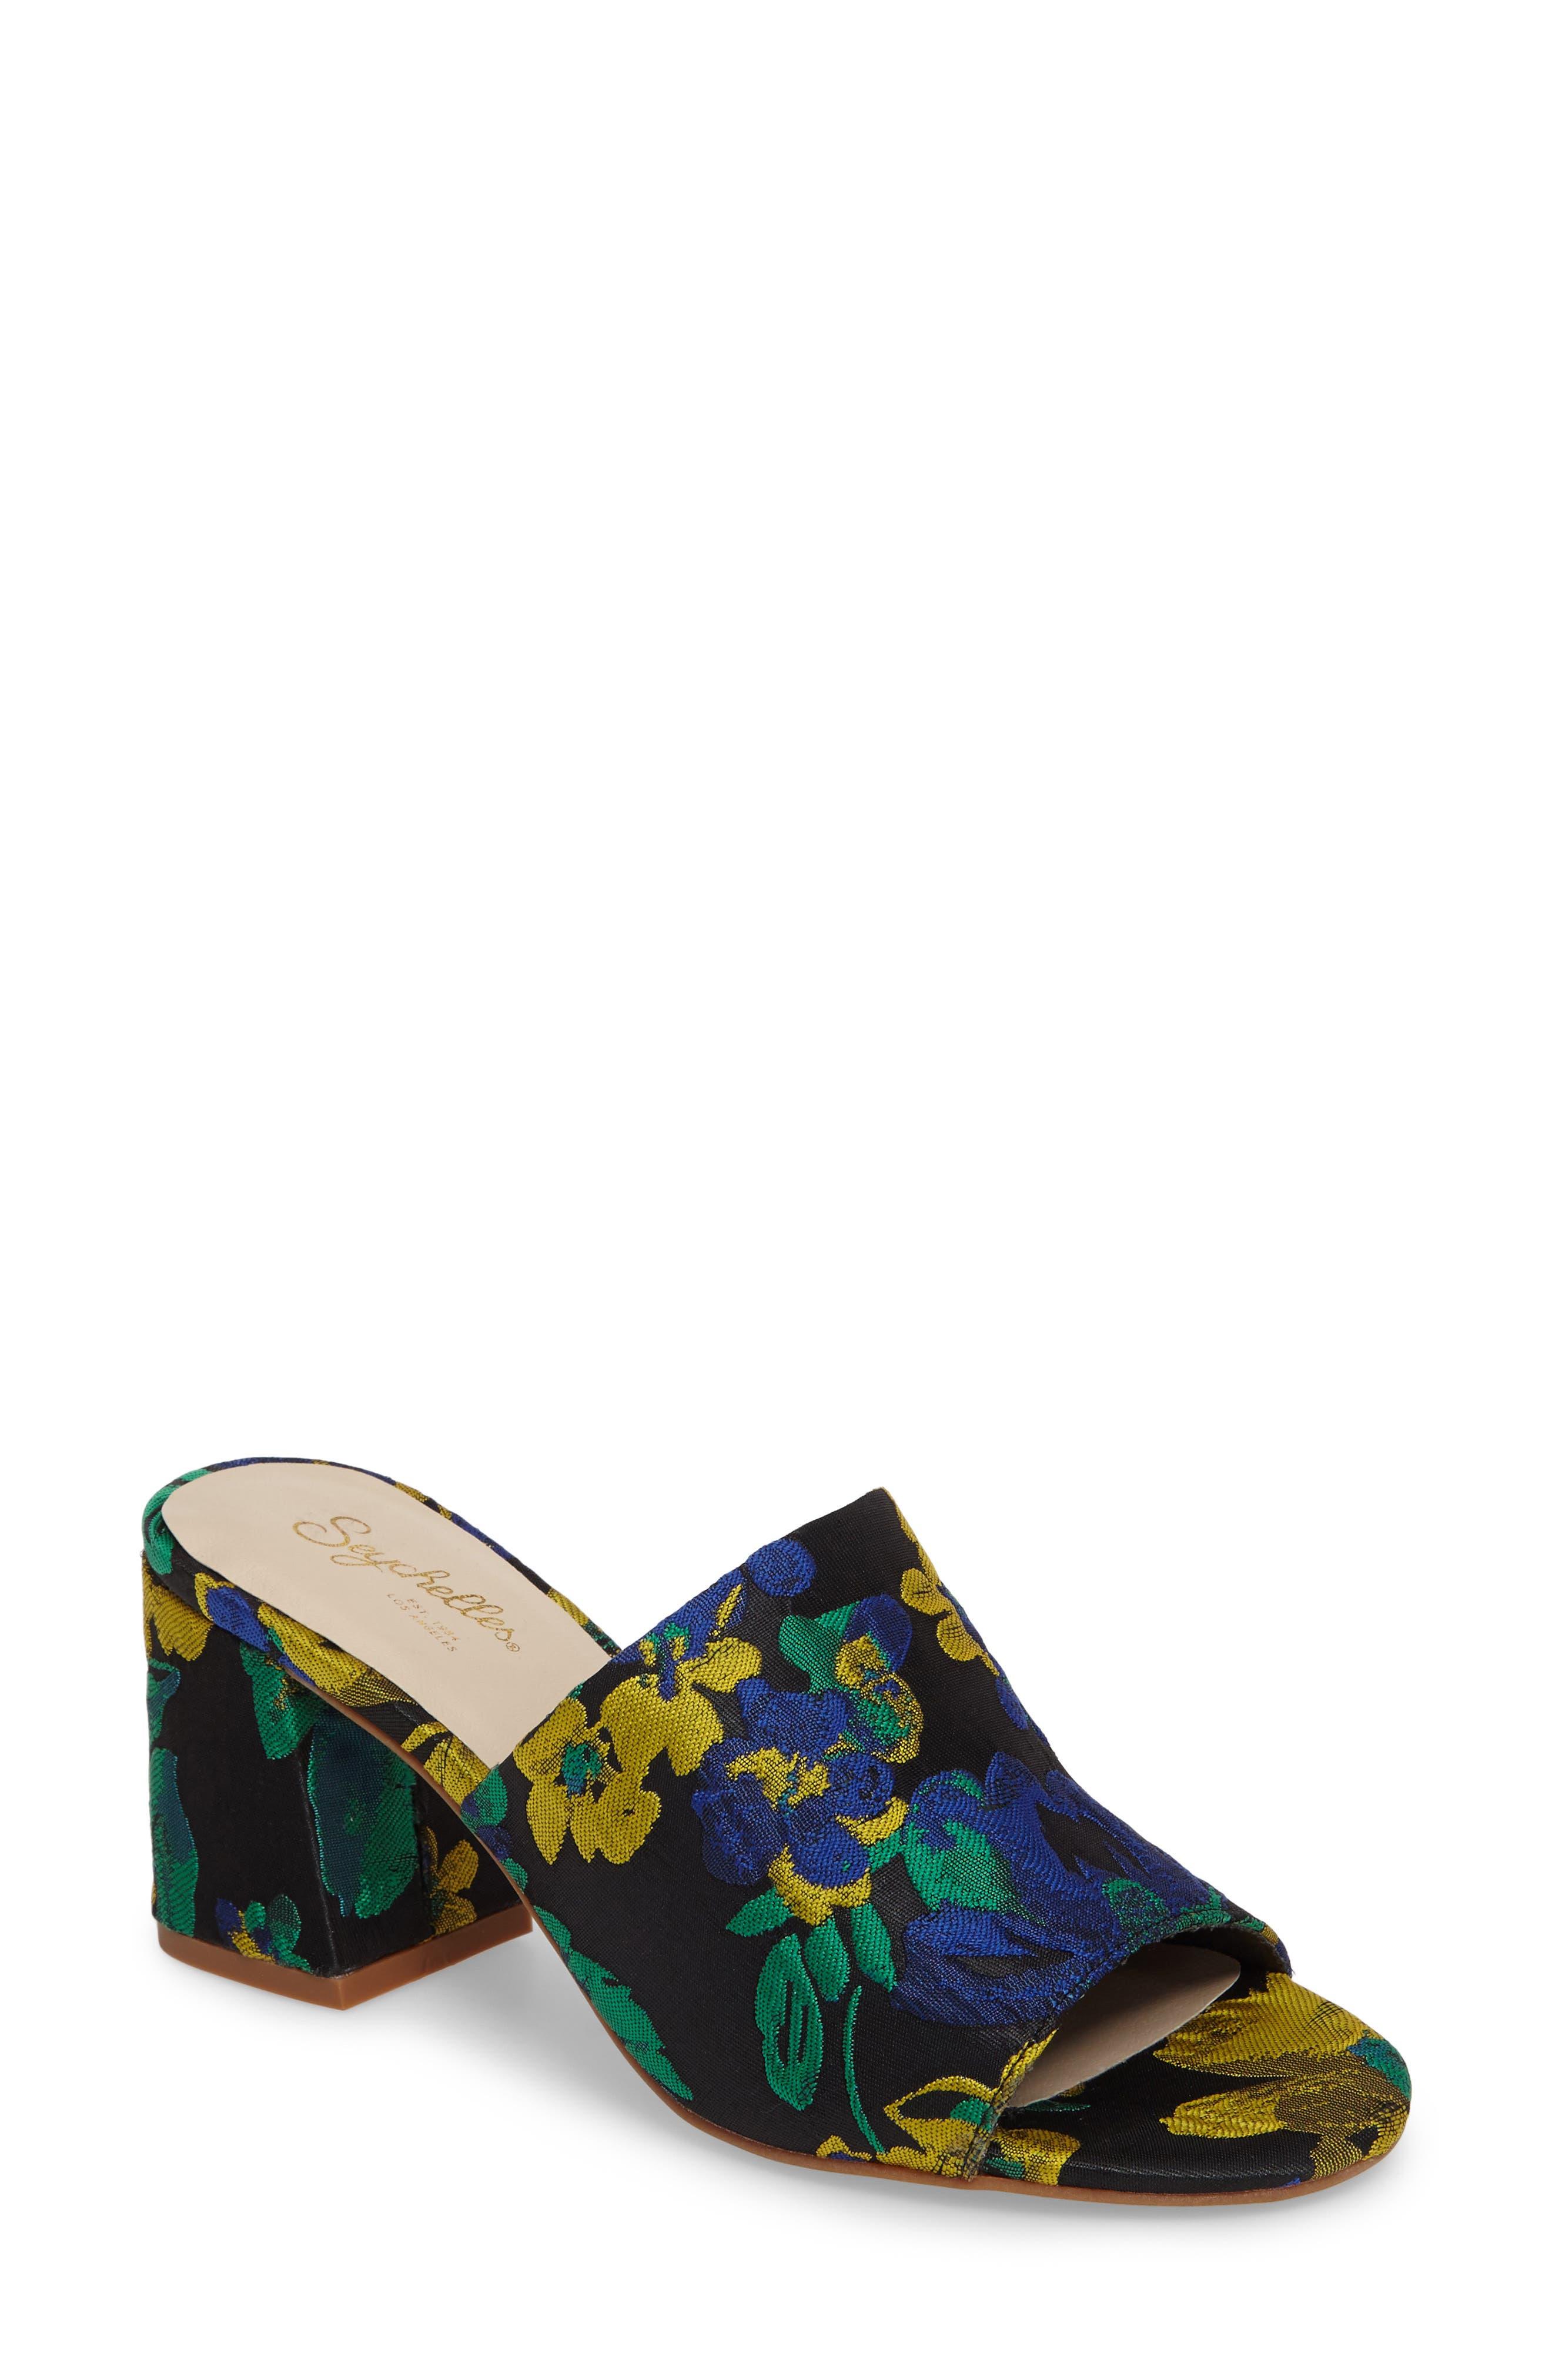 Commute Floral Flared Heel Sandal,                             Main thumbnail 1, color,                             002